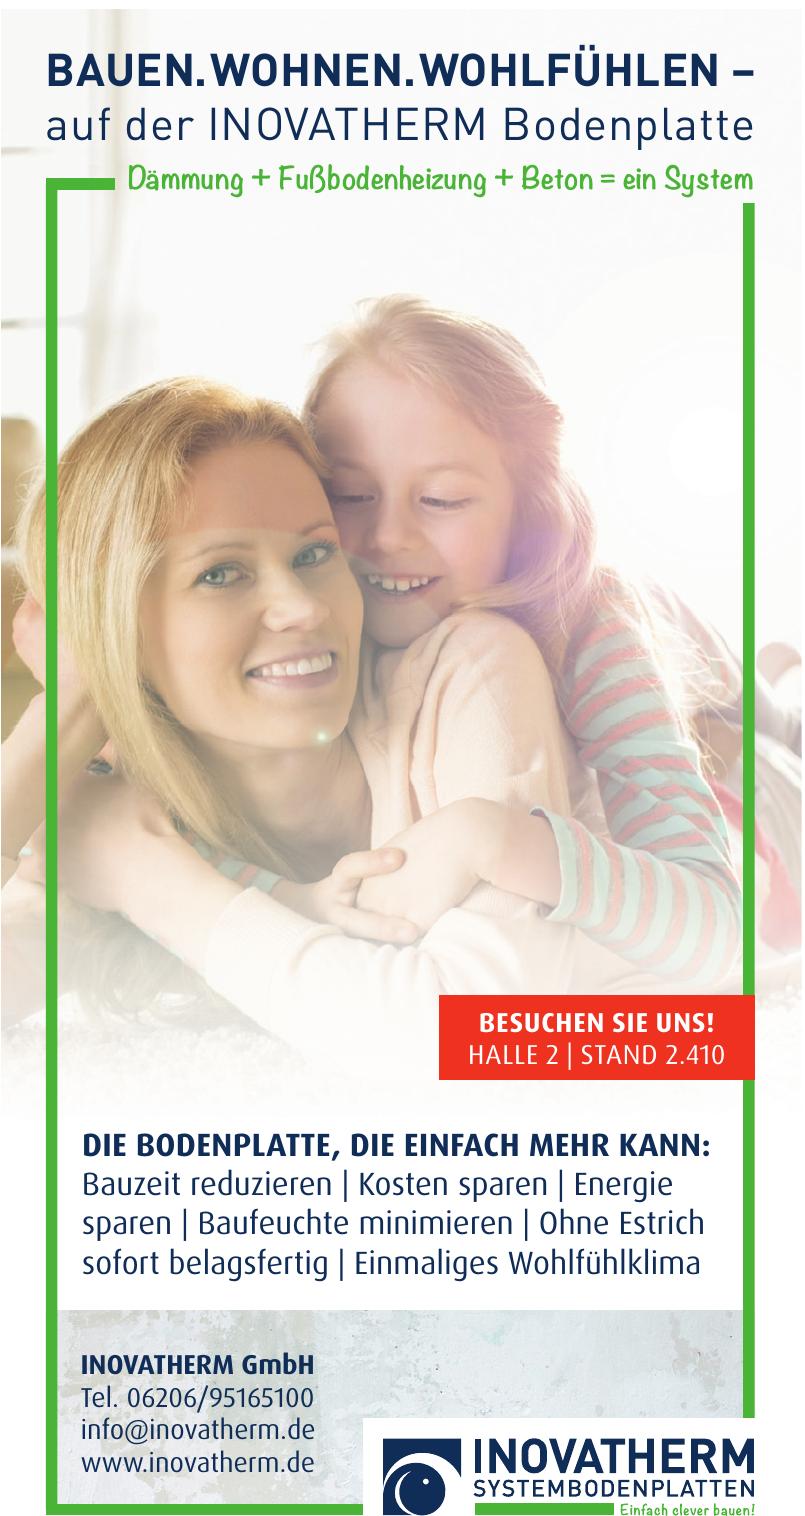 INOVATHERM GmbH